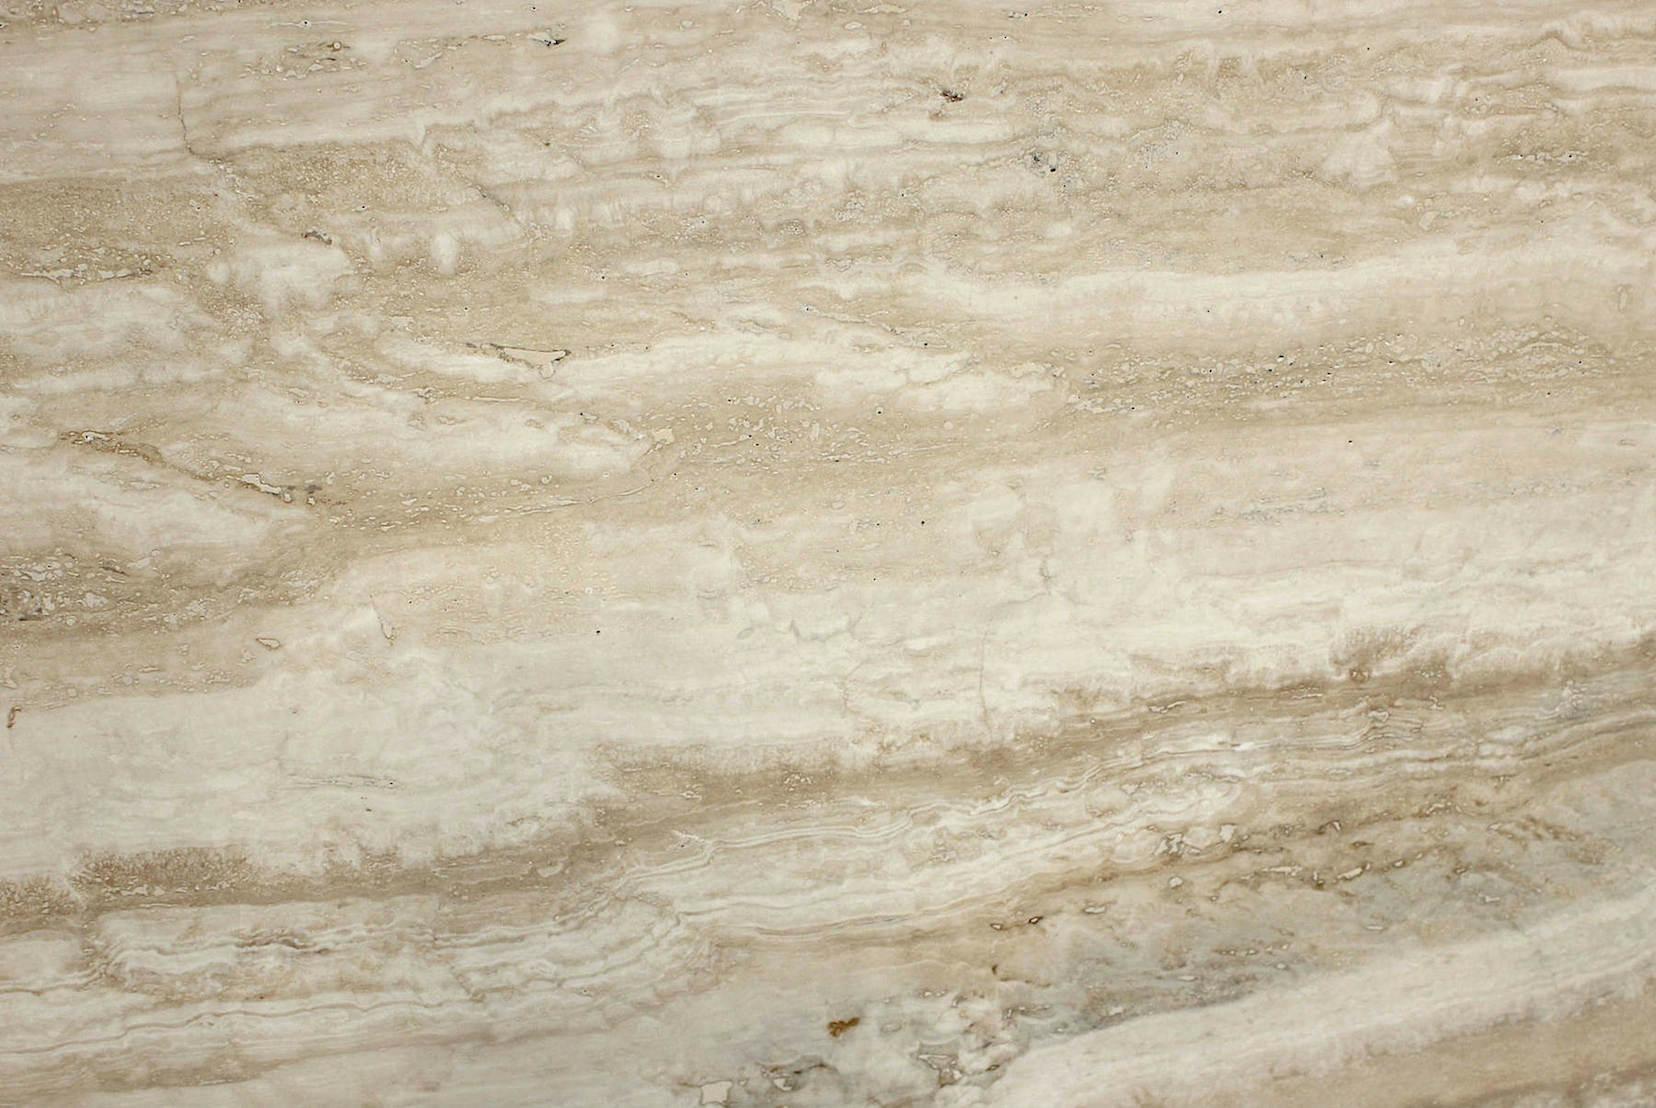 Travertine Alabastrino  Marble Trend  Marble Granite